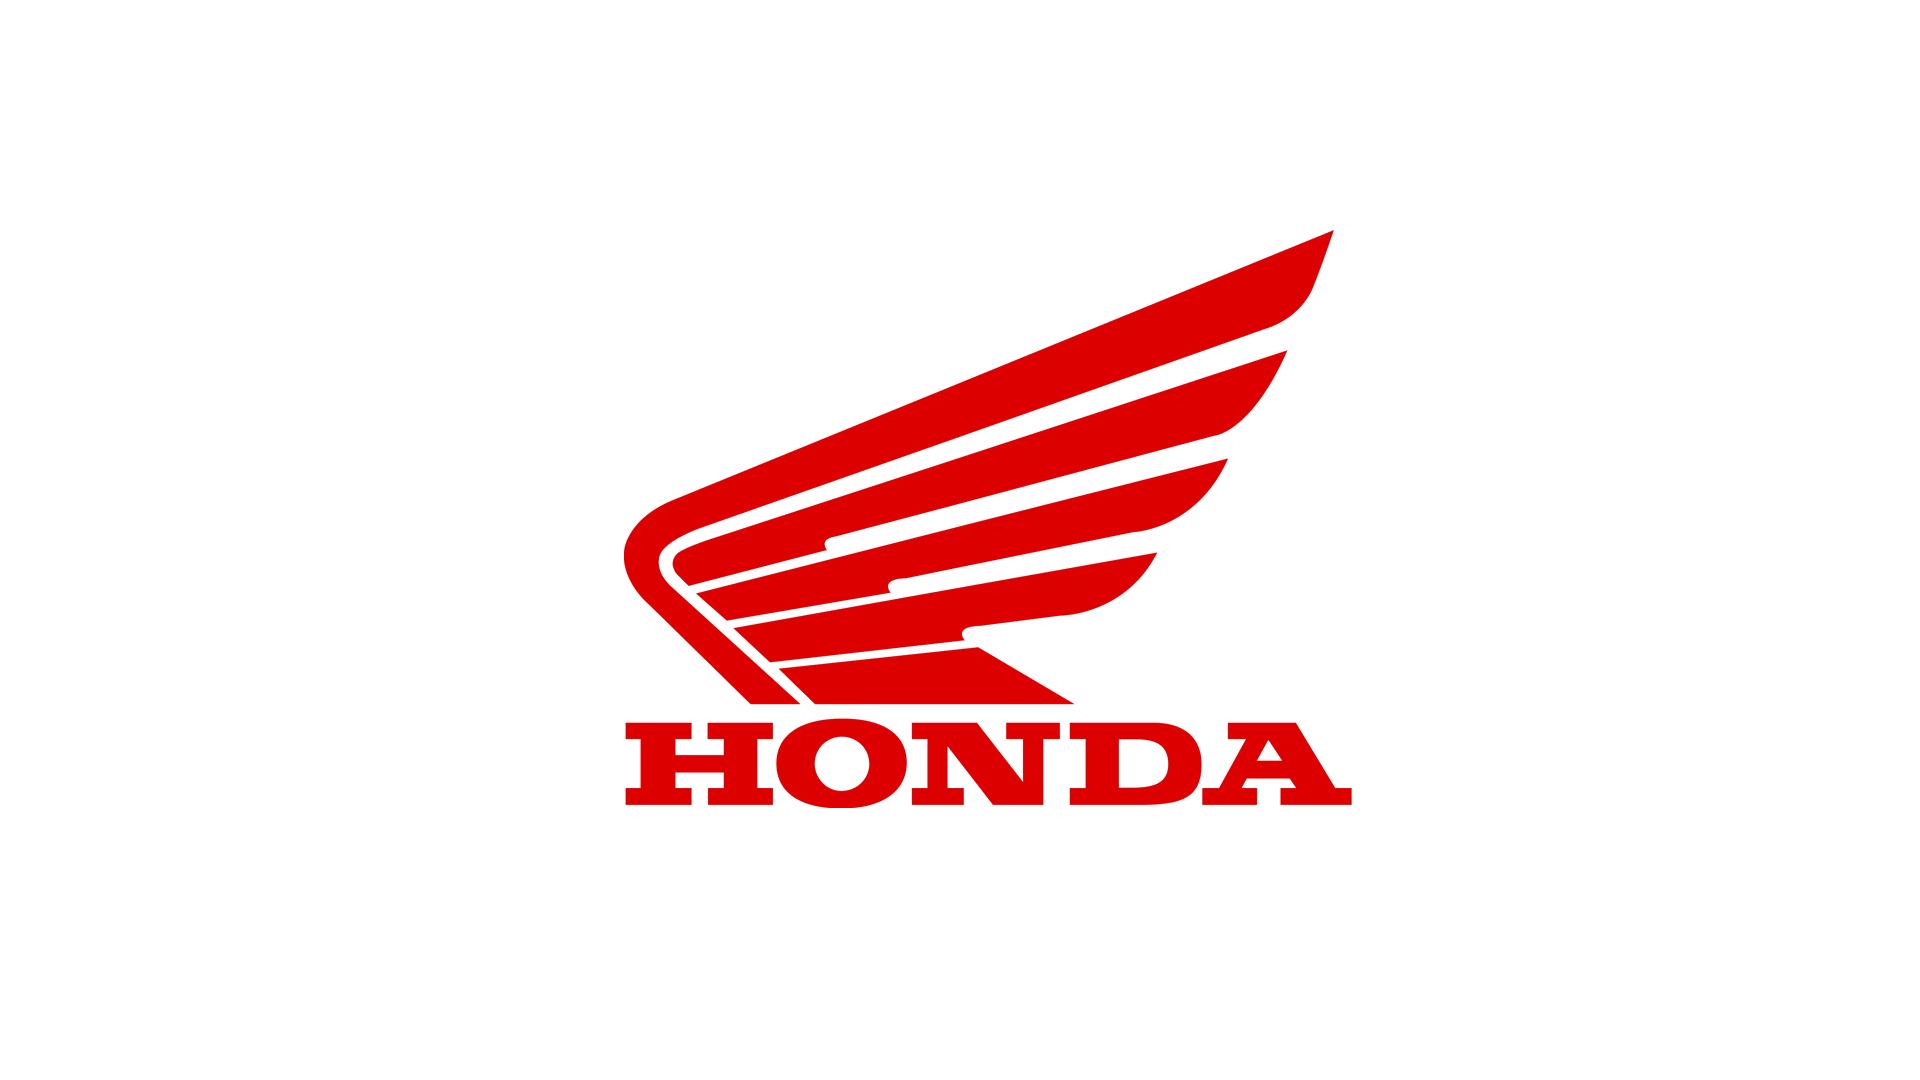 Patrocinadores - Honda